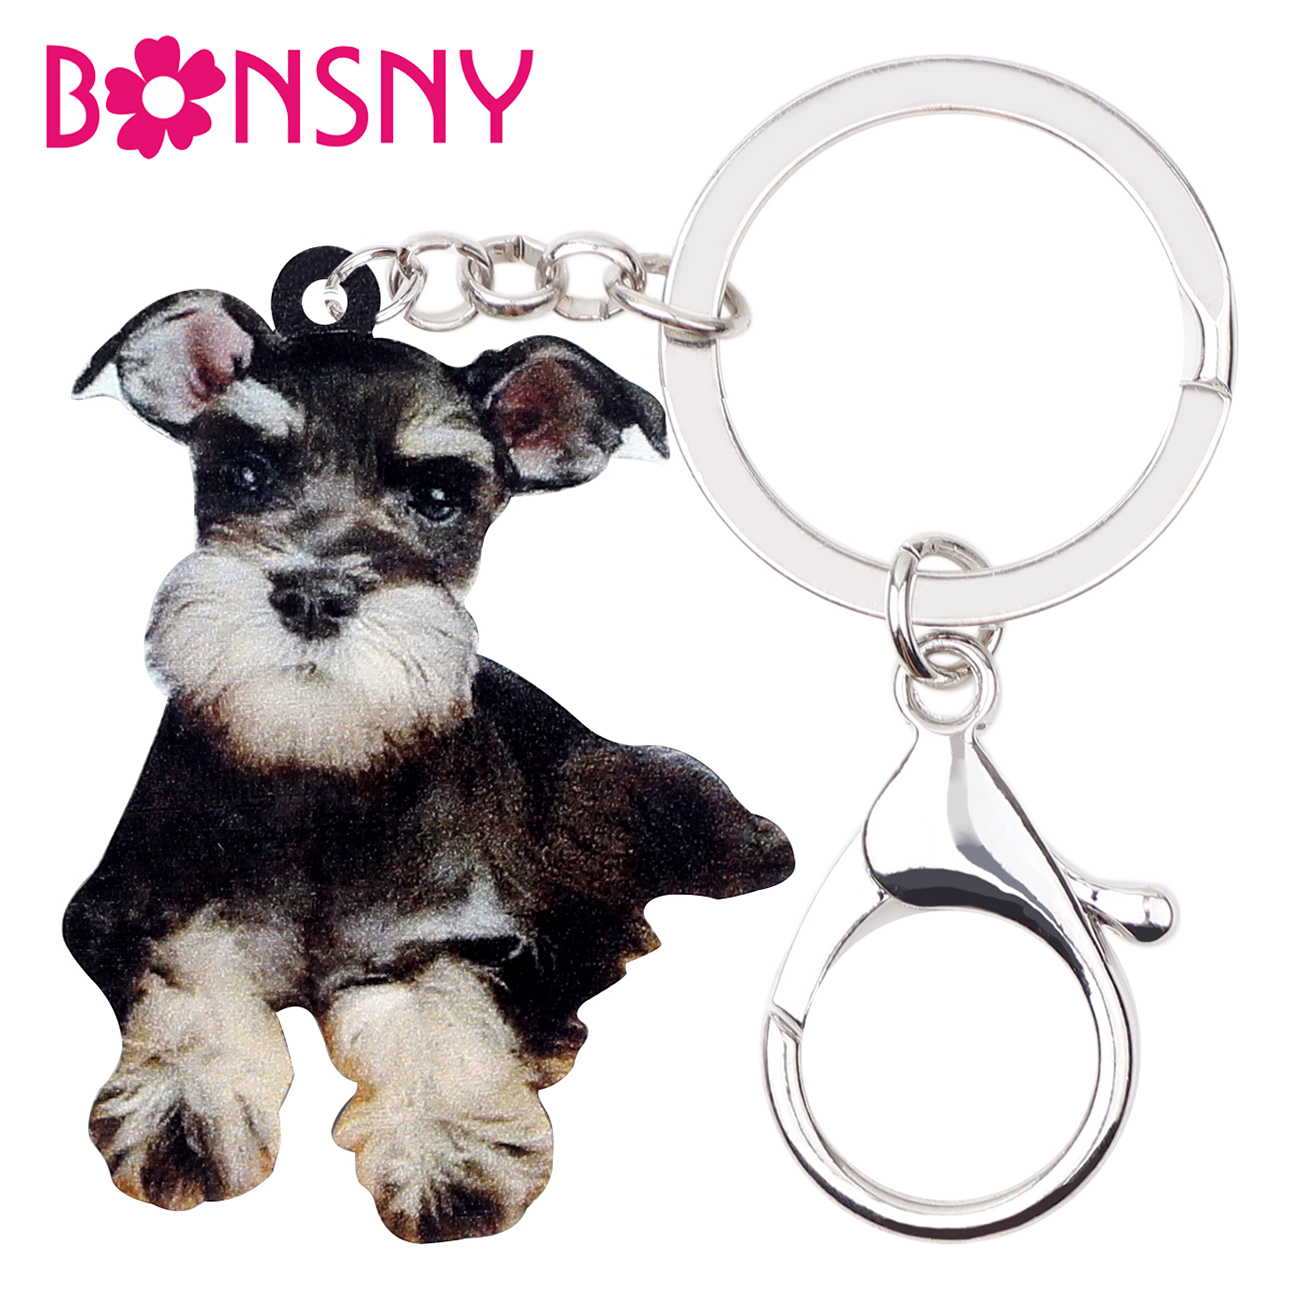 7d3f3dab0e Bonsny Acrylic Anime Schnauzer Dog Key Chain Keychains Rings Holder Novelty  Animal Jewelry For Women Girls